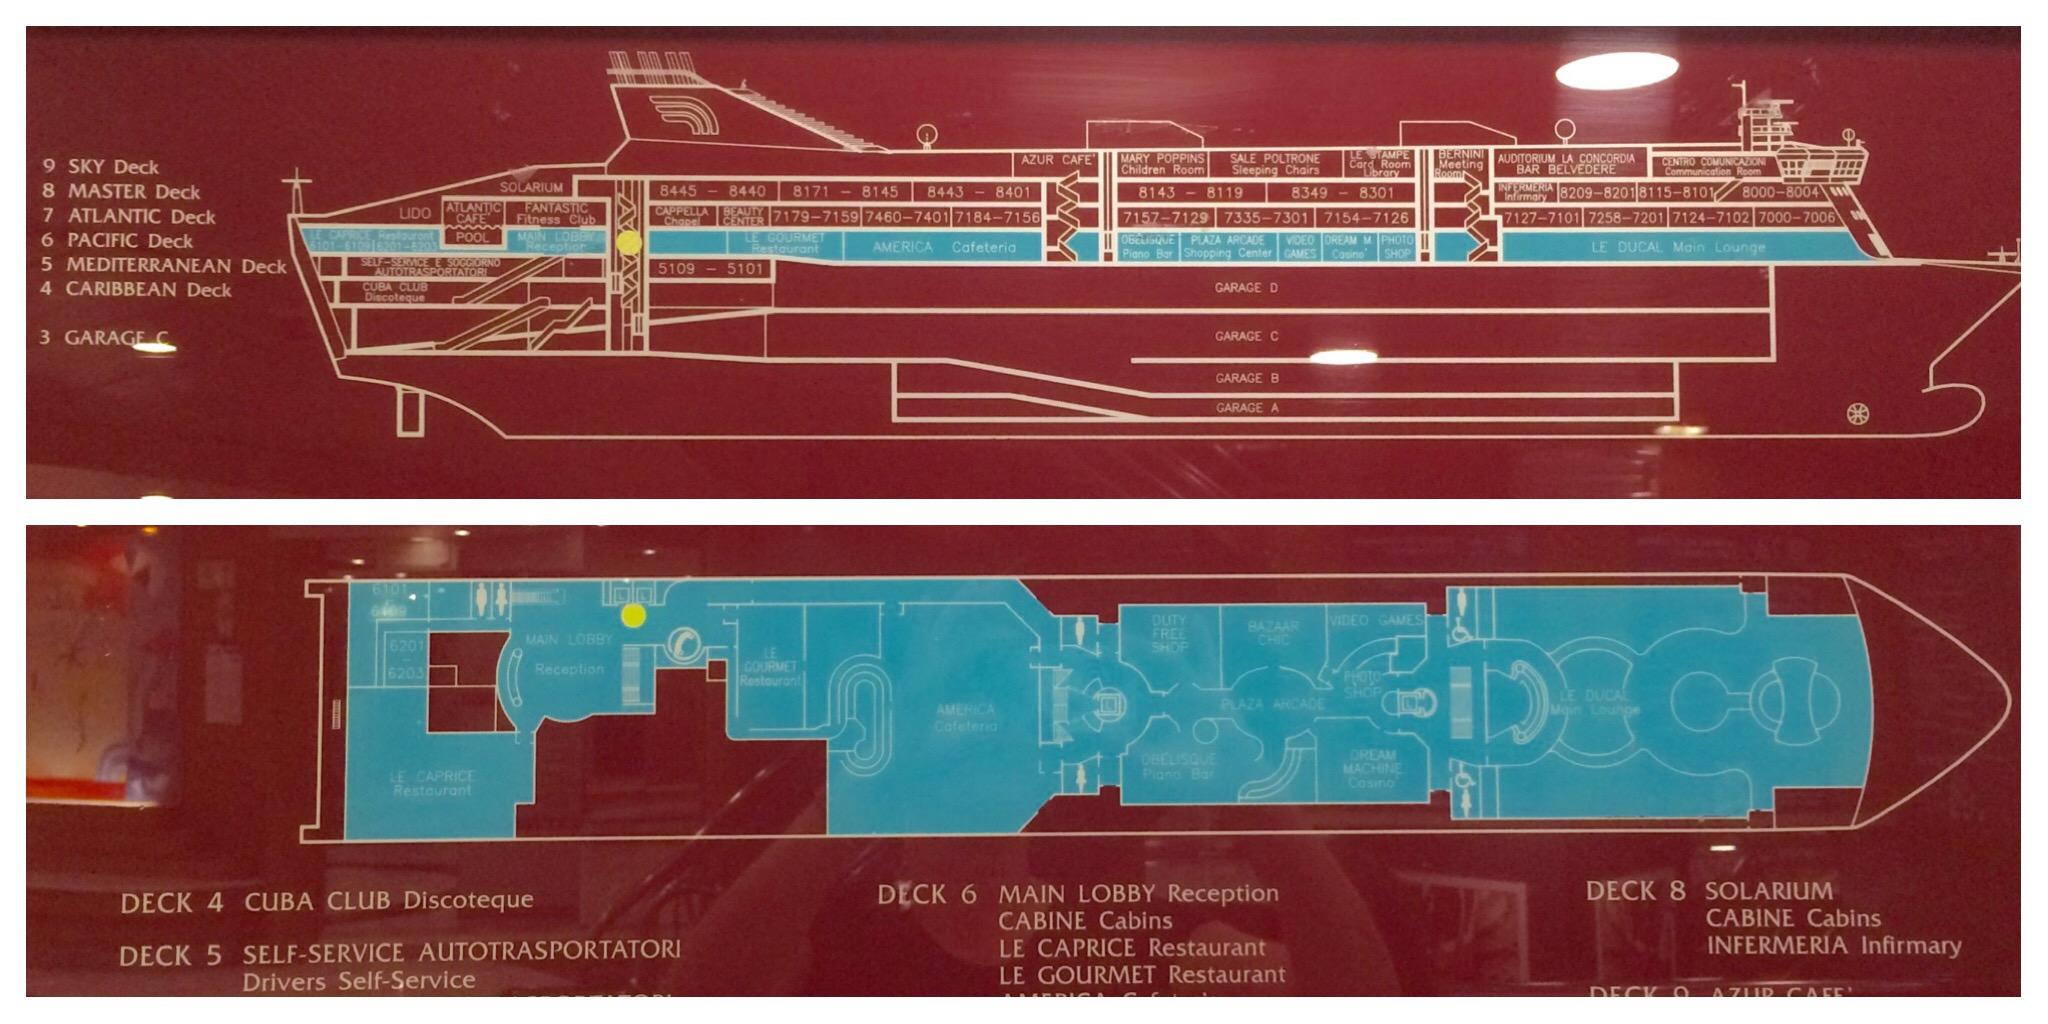 GNV ferry Barcelona to Genoa Deck Plan Fantastic